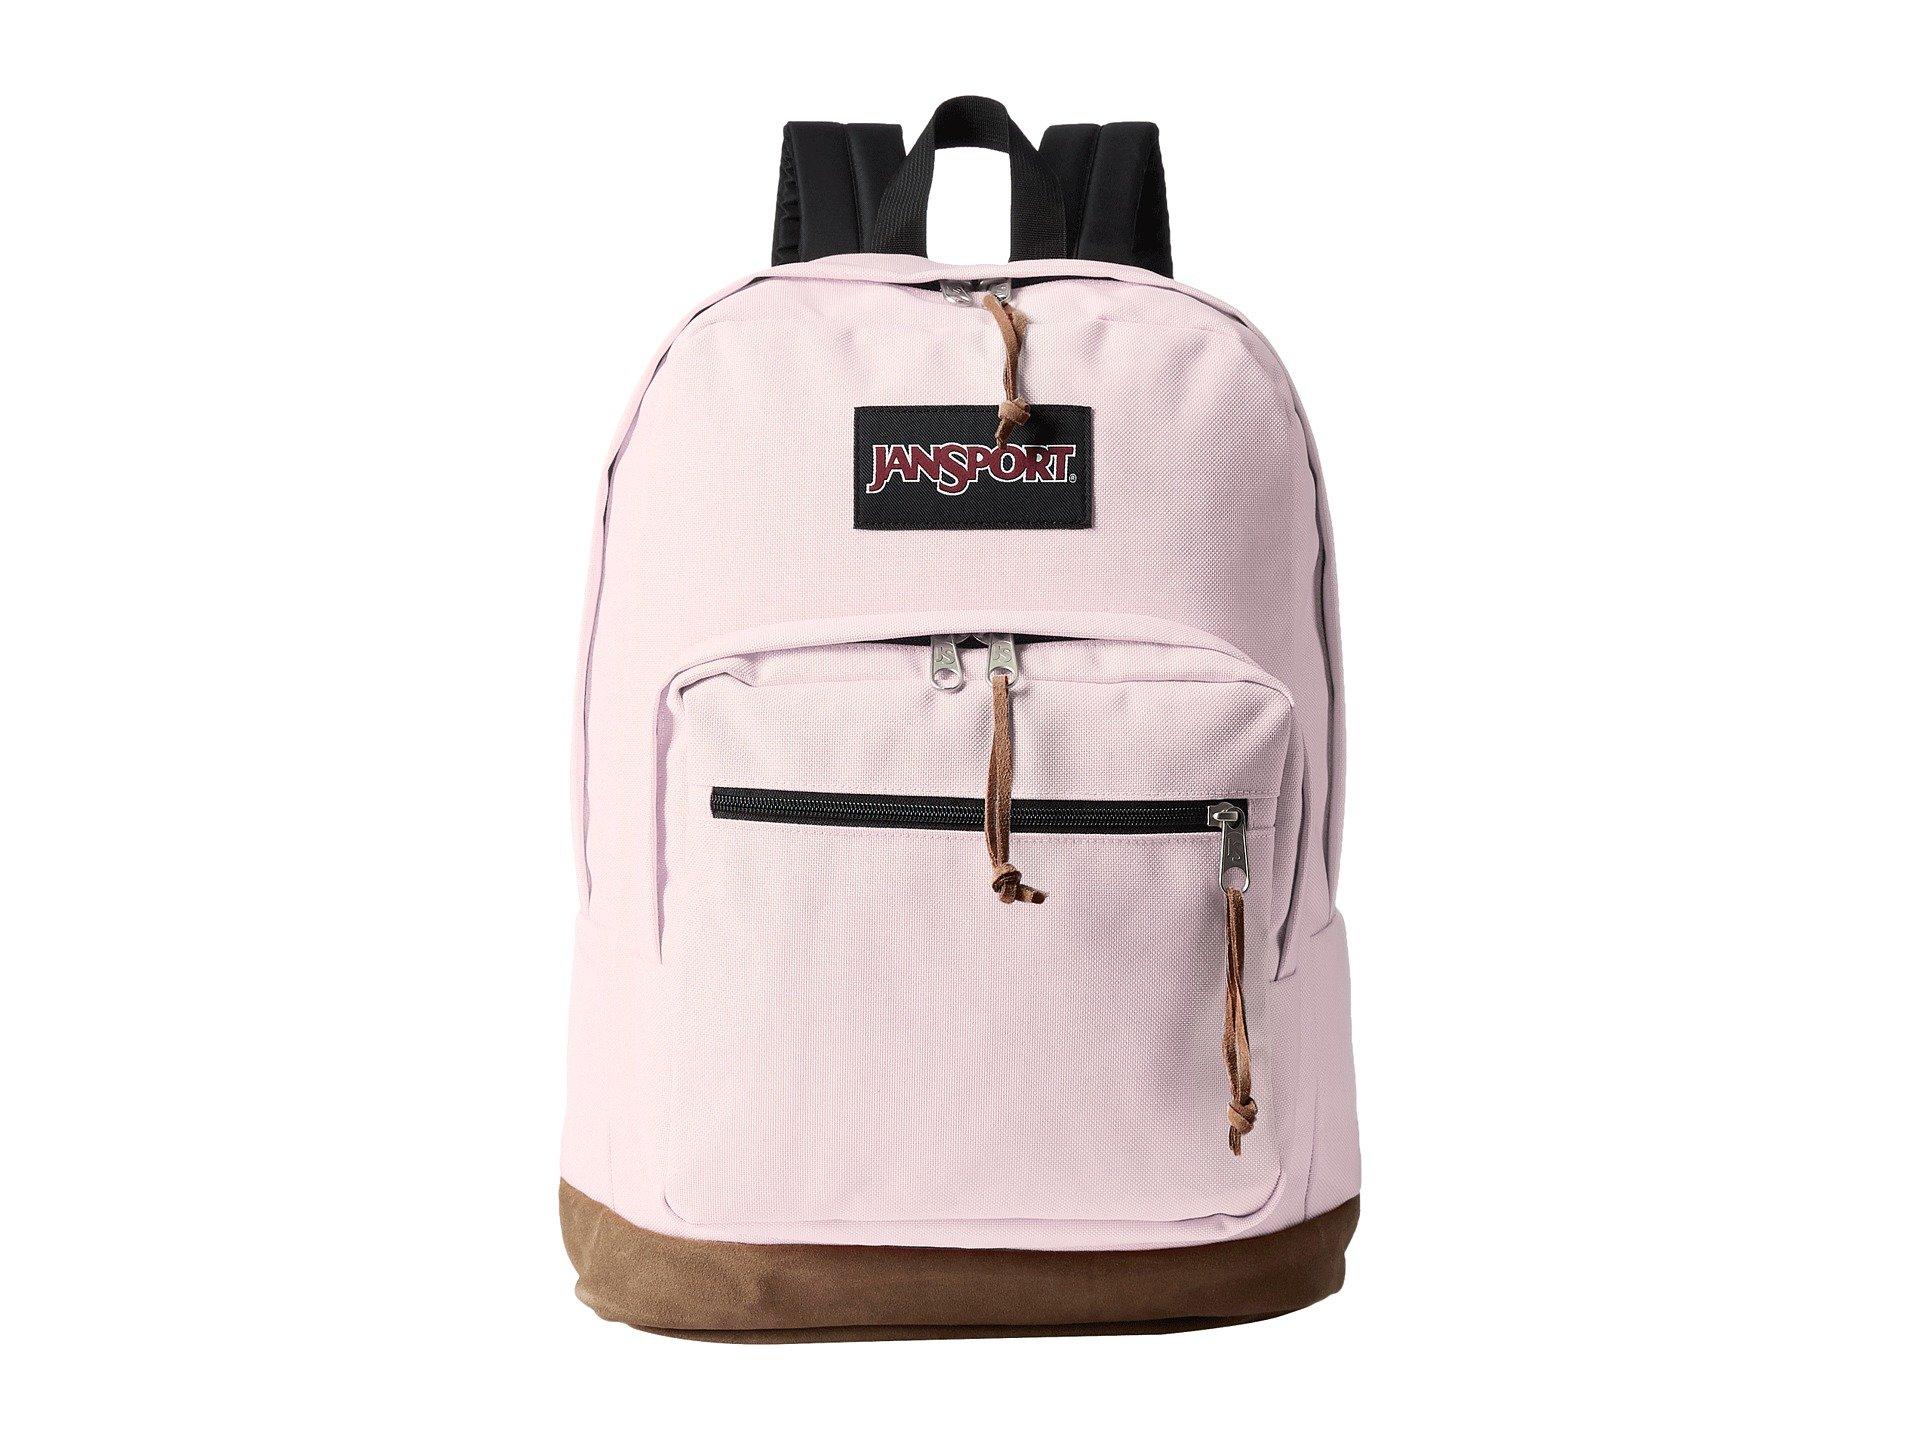 Jansport Right Jansport Pink Pink Jansport Pink Blush Right Right Pack Pack Pack Blush Blush pFpqxwEr